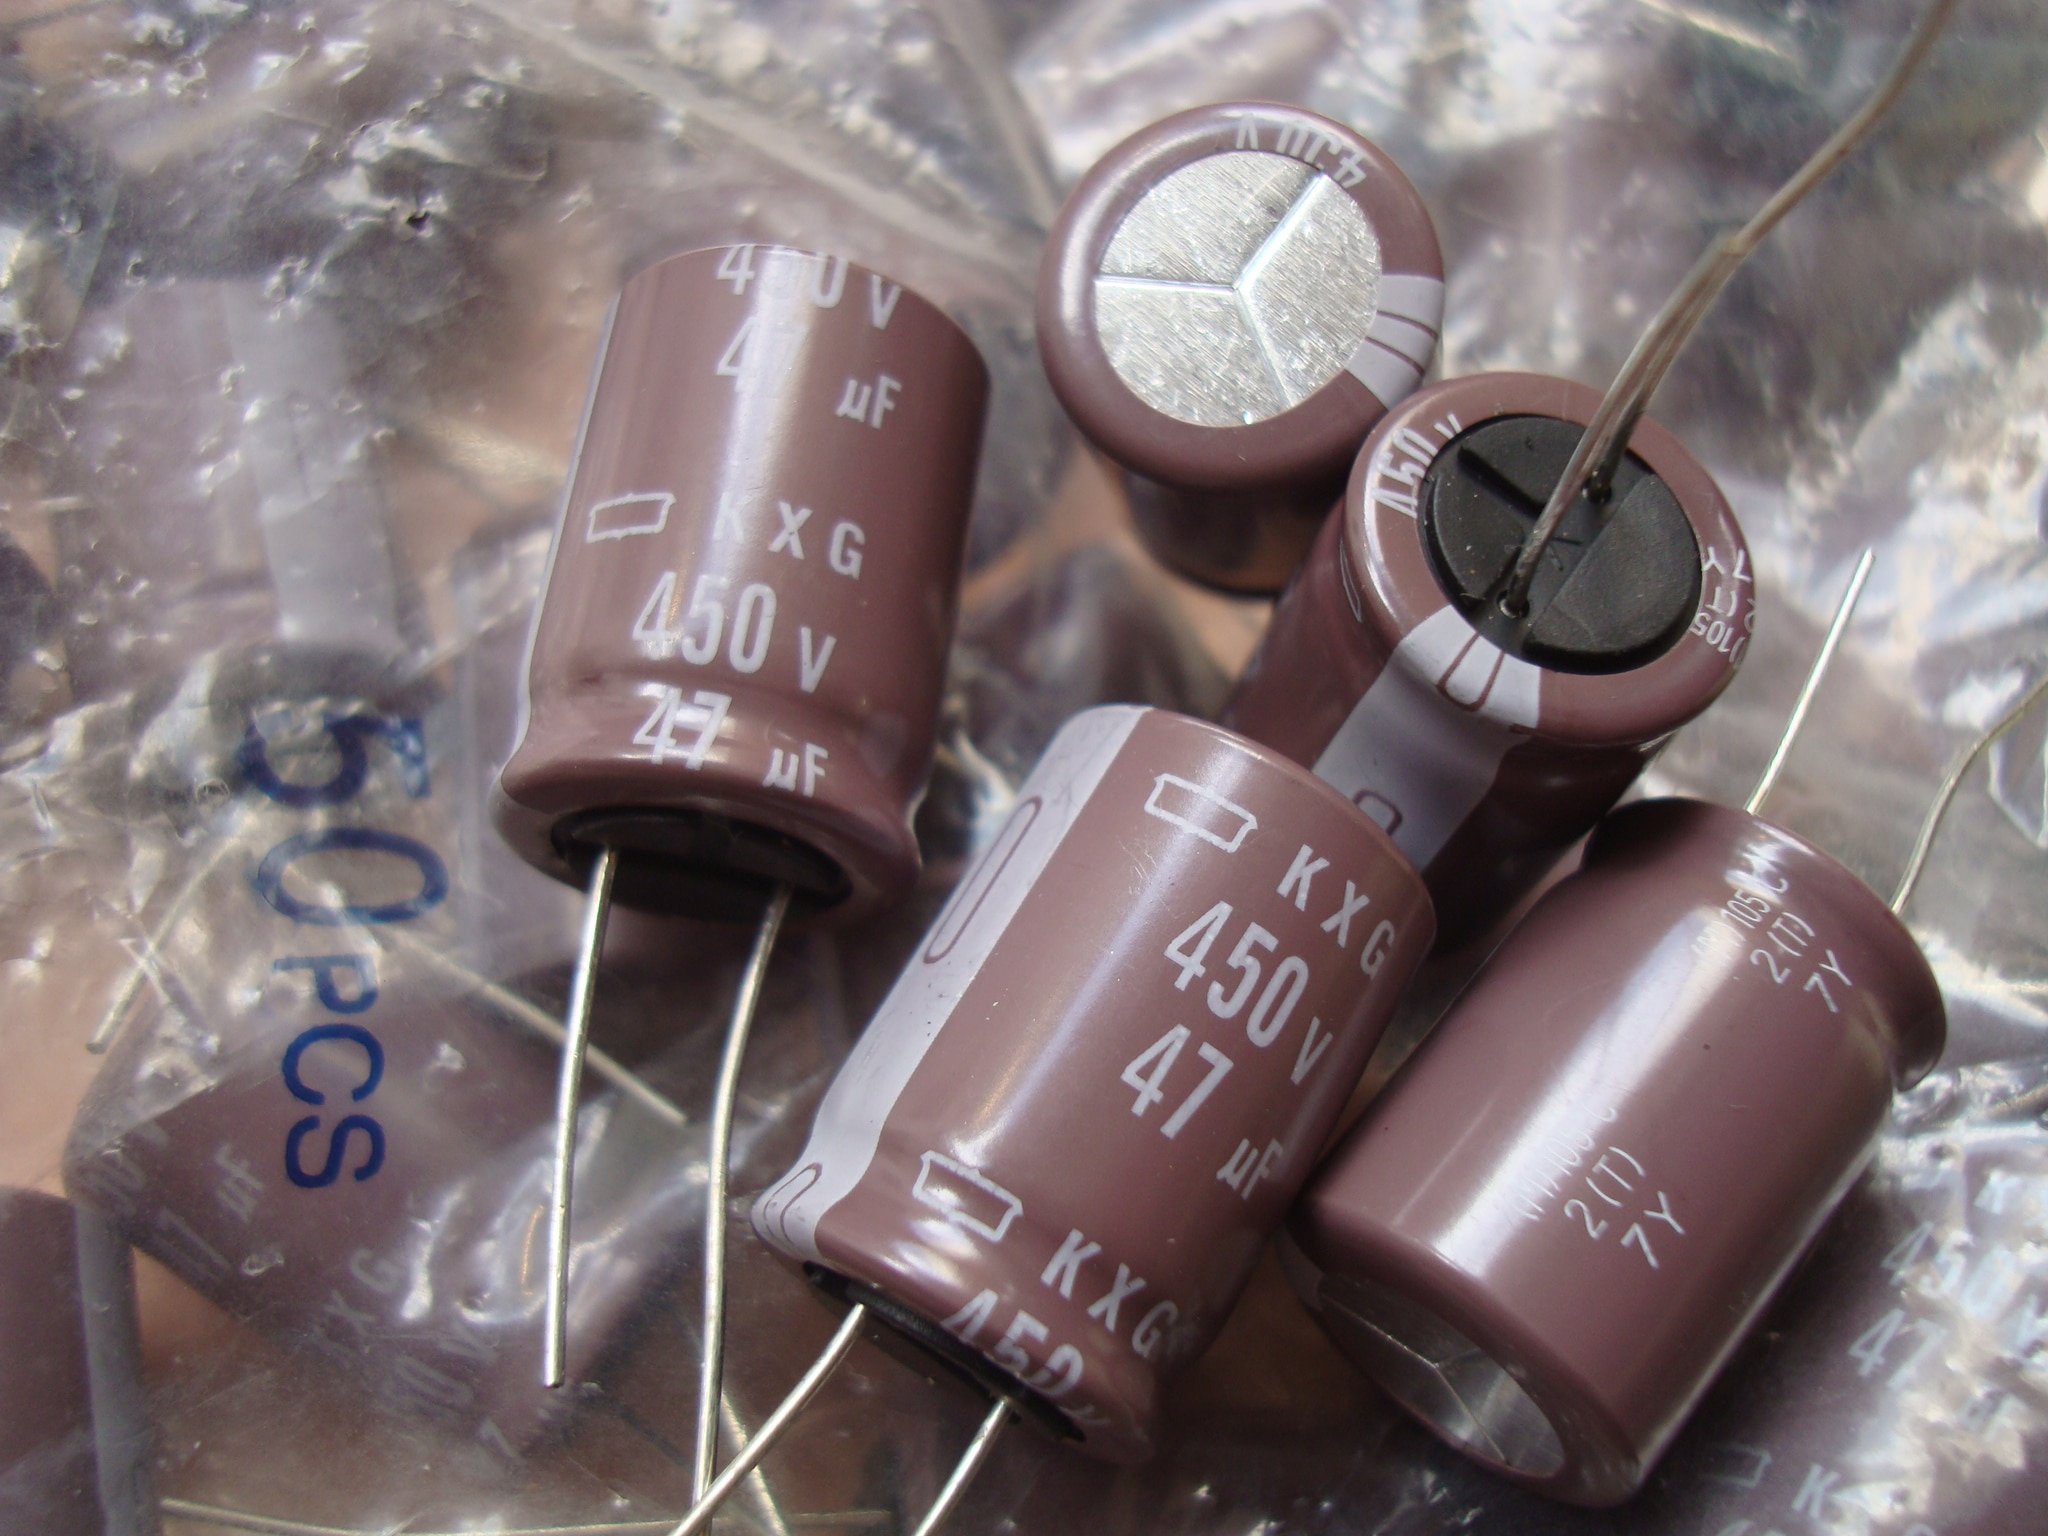 50pcs/lot Original JAPAN NIPPON KXG series 105C high frequency capacitor aluminum electrolytic capacitor free shipping 100pcs lot fujitsu functional all series solid capacitor polymer capacitor smd solid capacitor free shipping